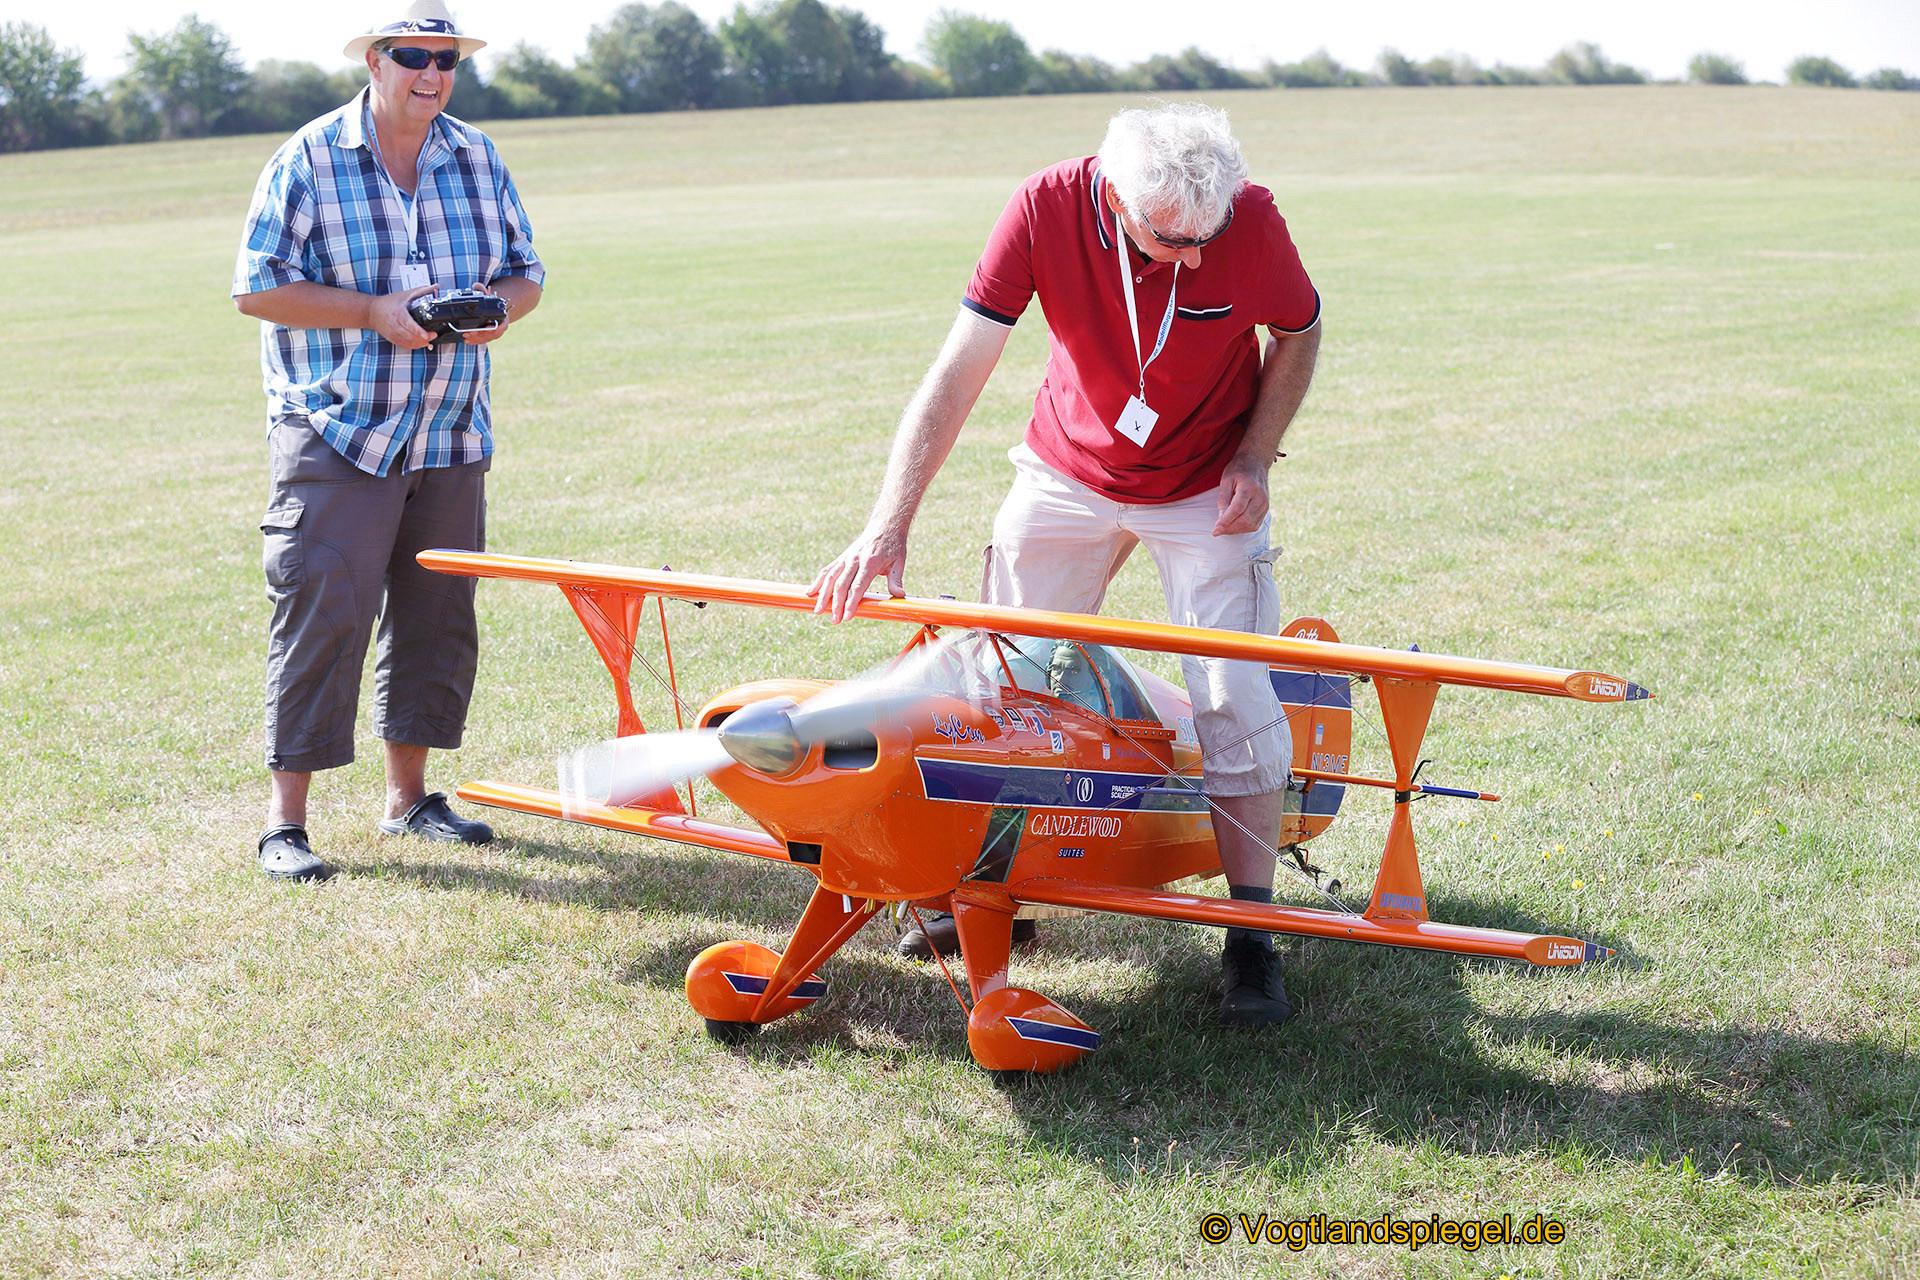 Modell-Flug-Show in Obergrochlitz